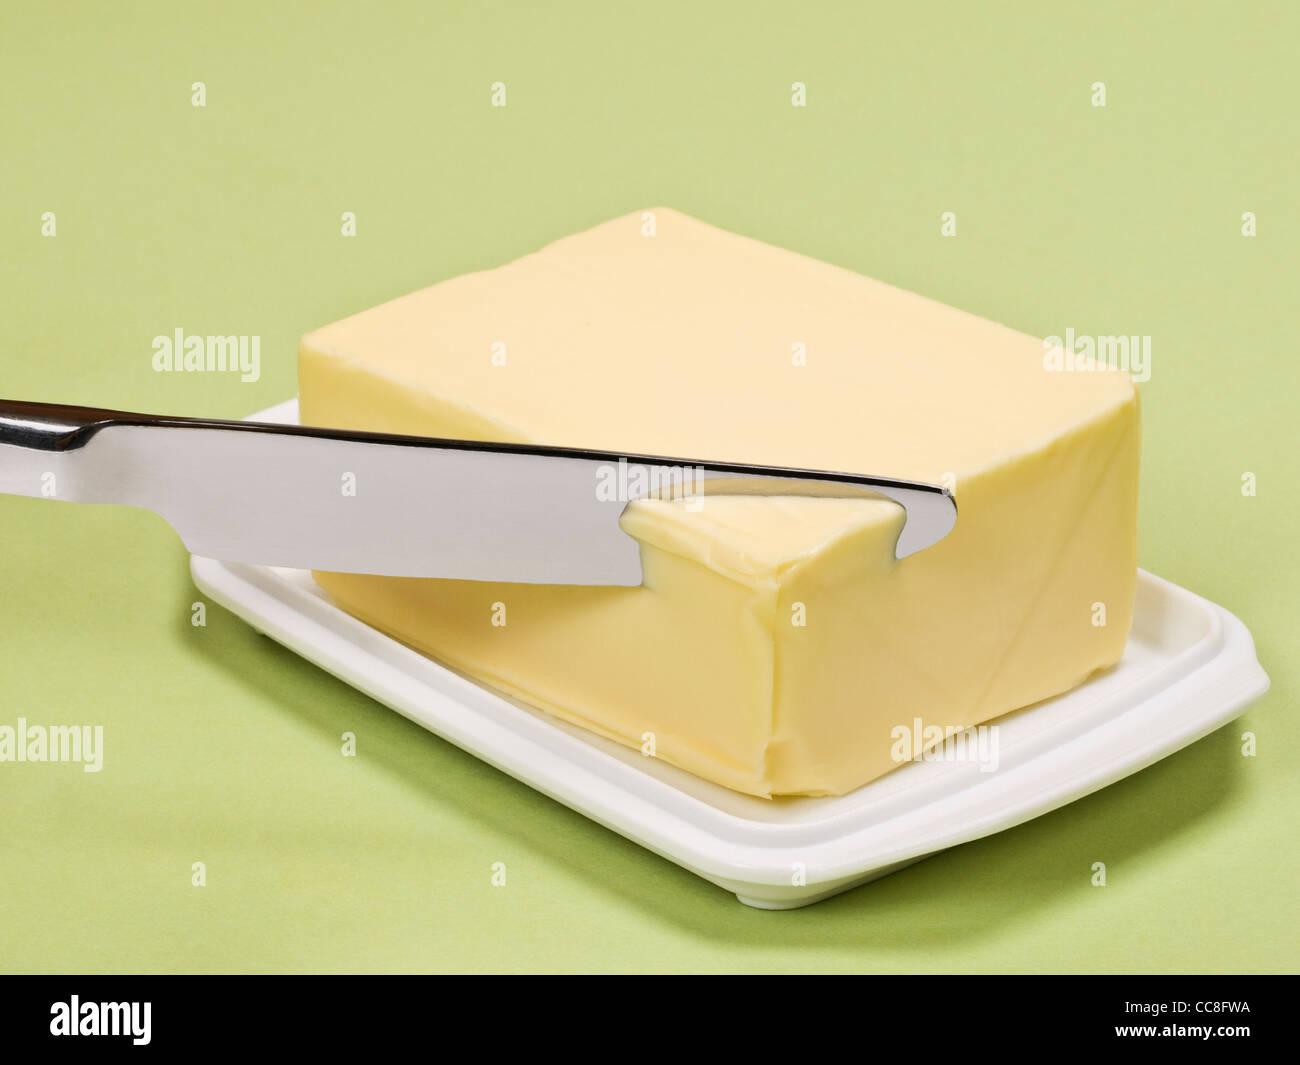 Ein Stück mantequilla wird angeschnitten | un pedazo de mantequilla está cortada Imagen De Stock